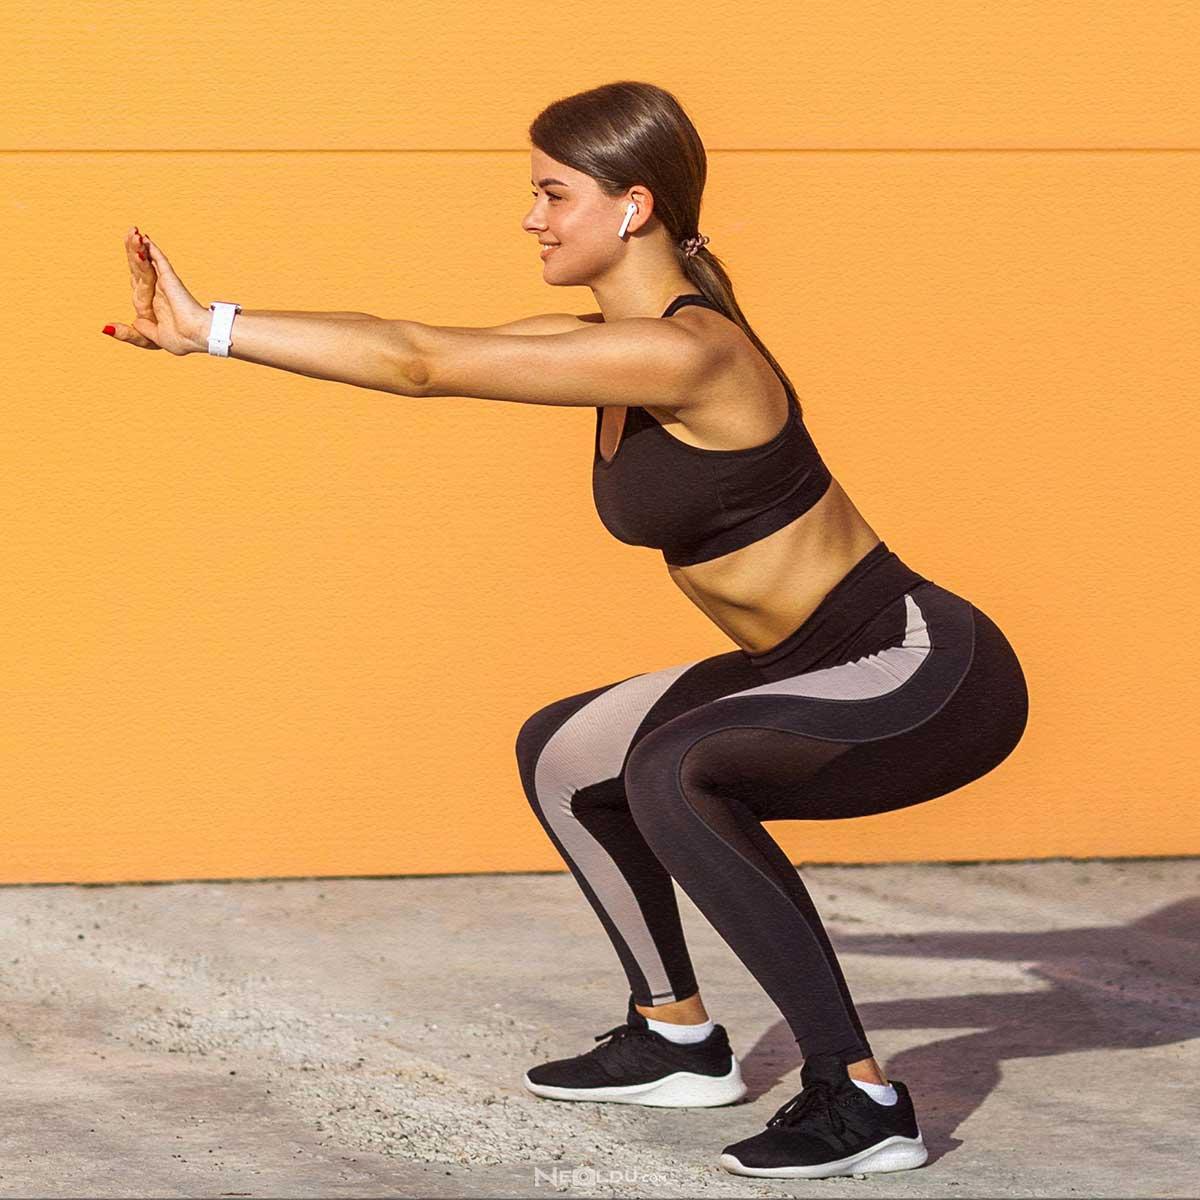 squat-.jpg